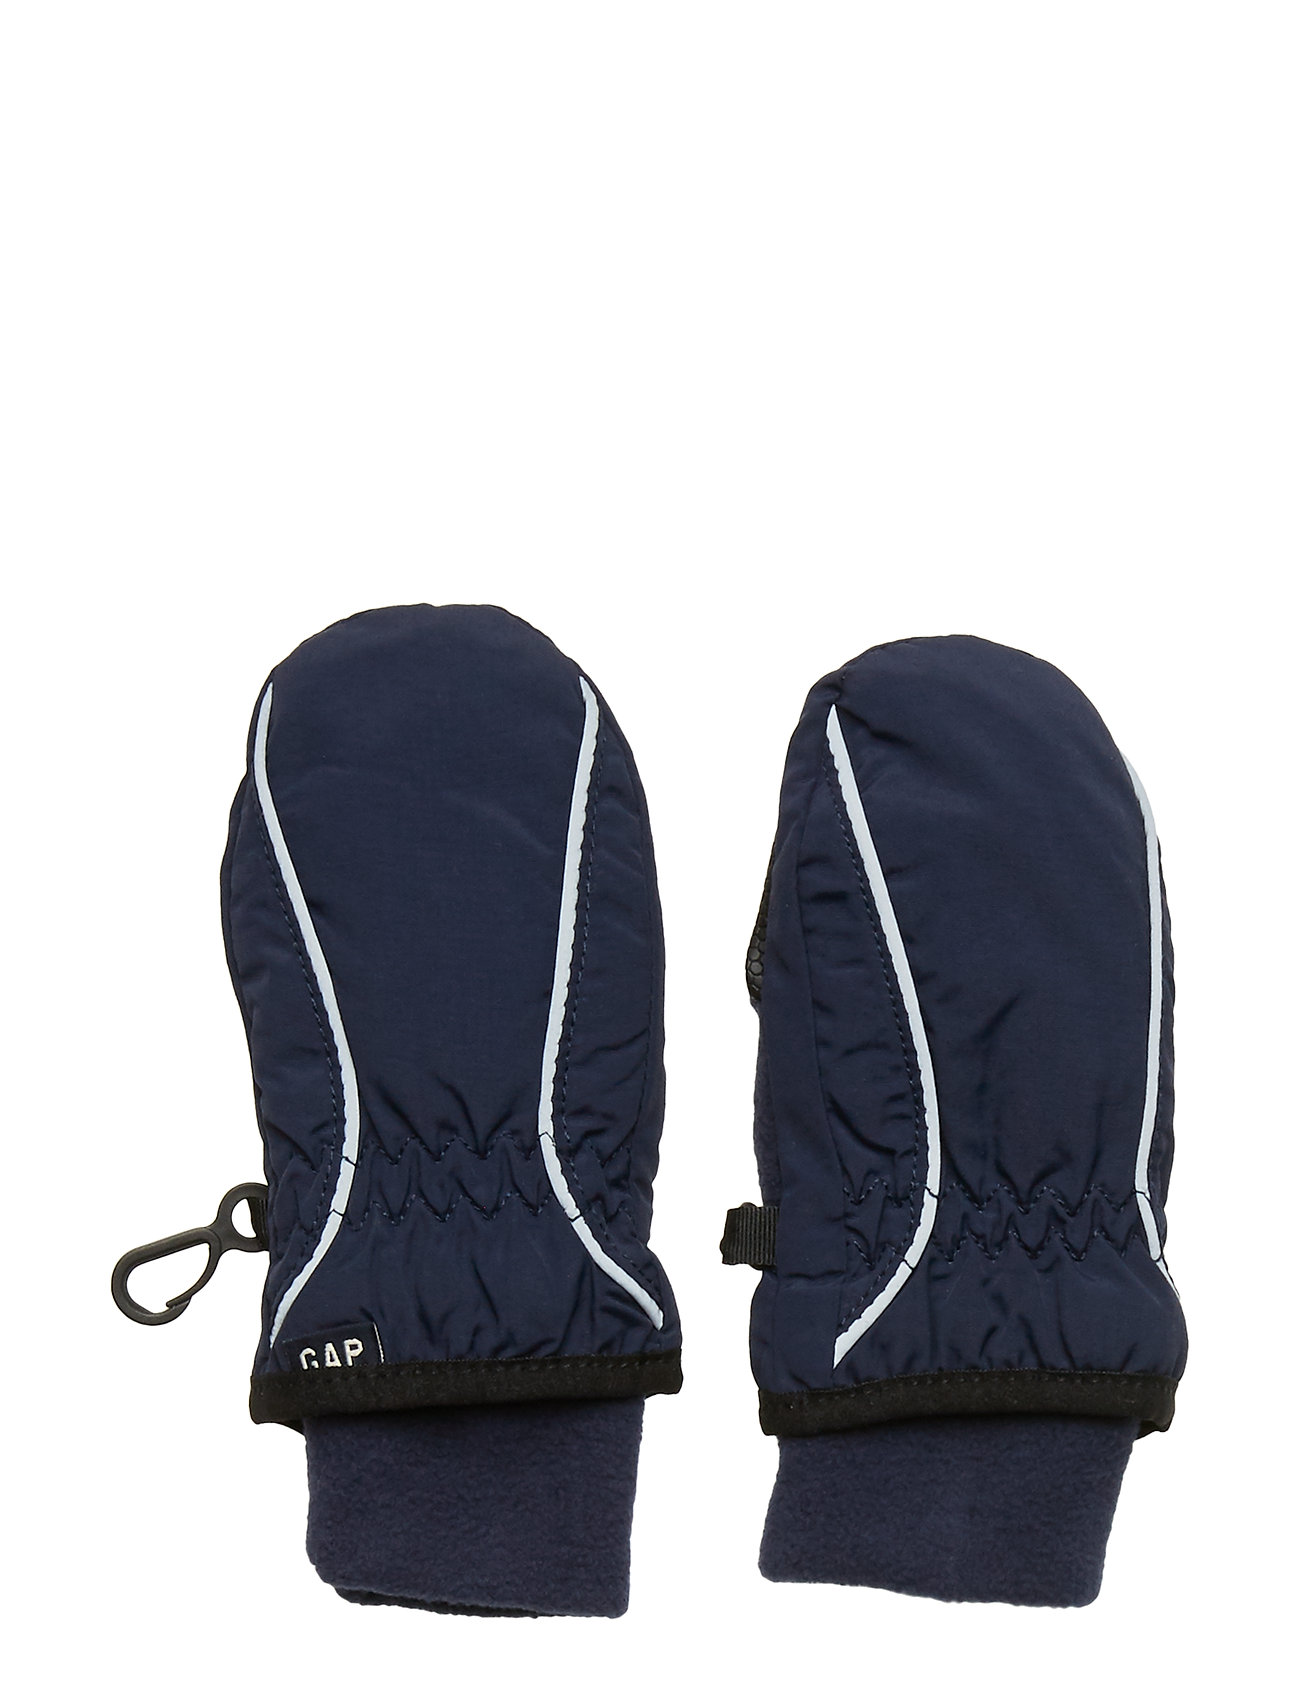 GAP Toddler ColdControl Gloves - TAPESTRY NAVY